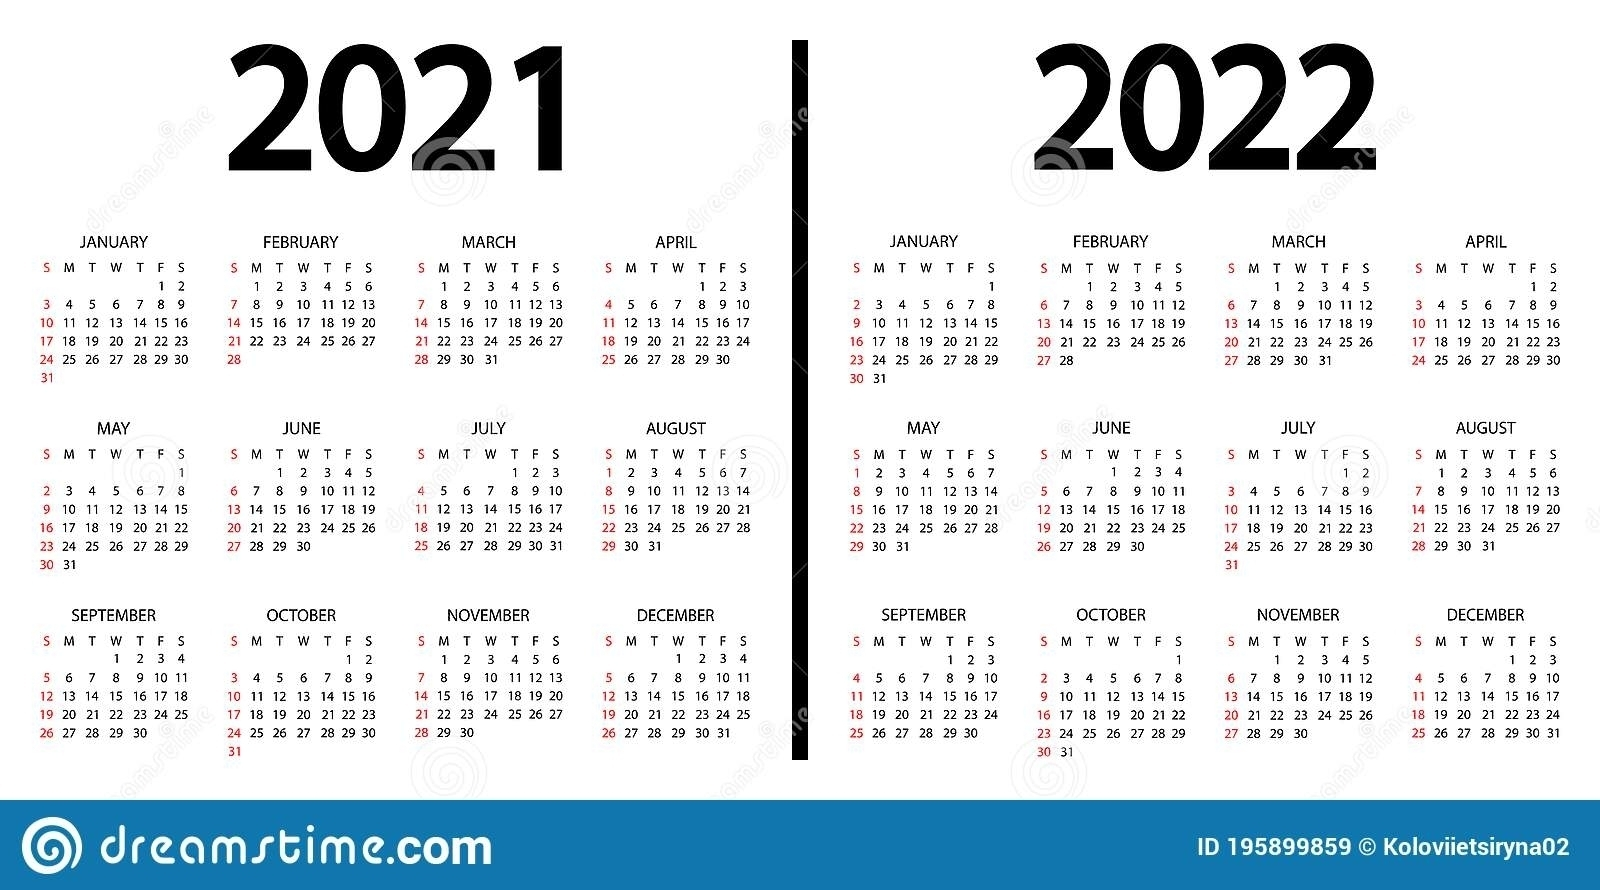 Catch How Many Days In 2021 Financial Calendar 2021 2022